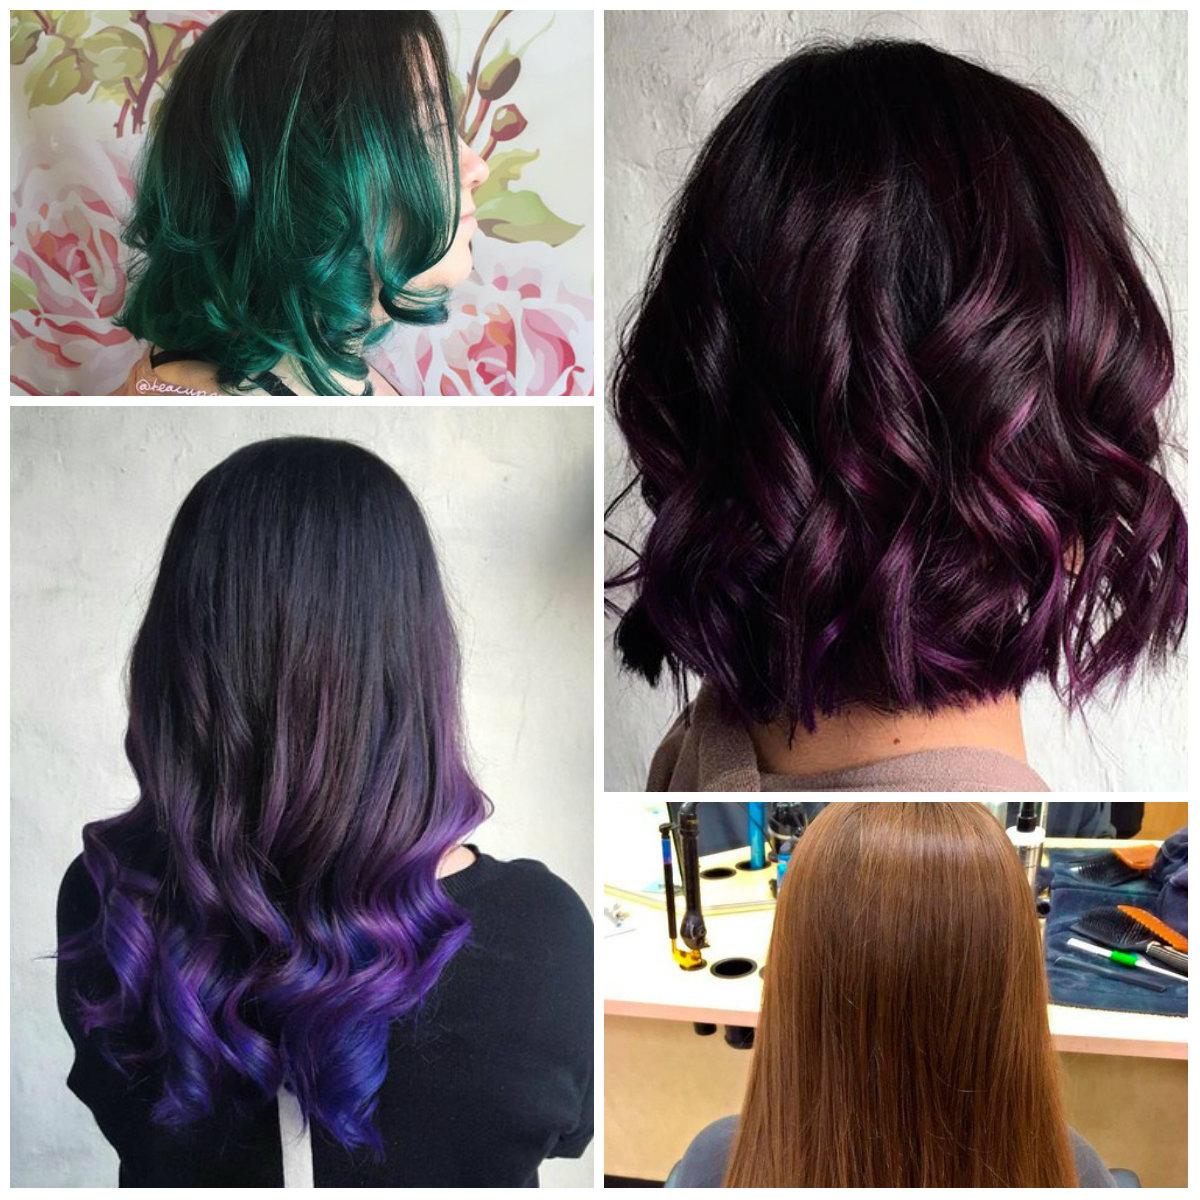 Dip-Dye-Hair-Color-Ideas-carlsbad-salon.jpg